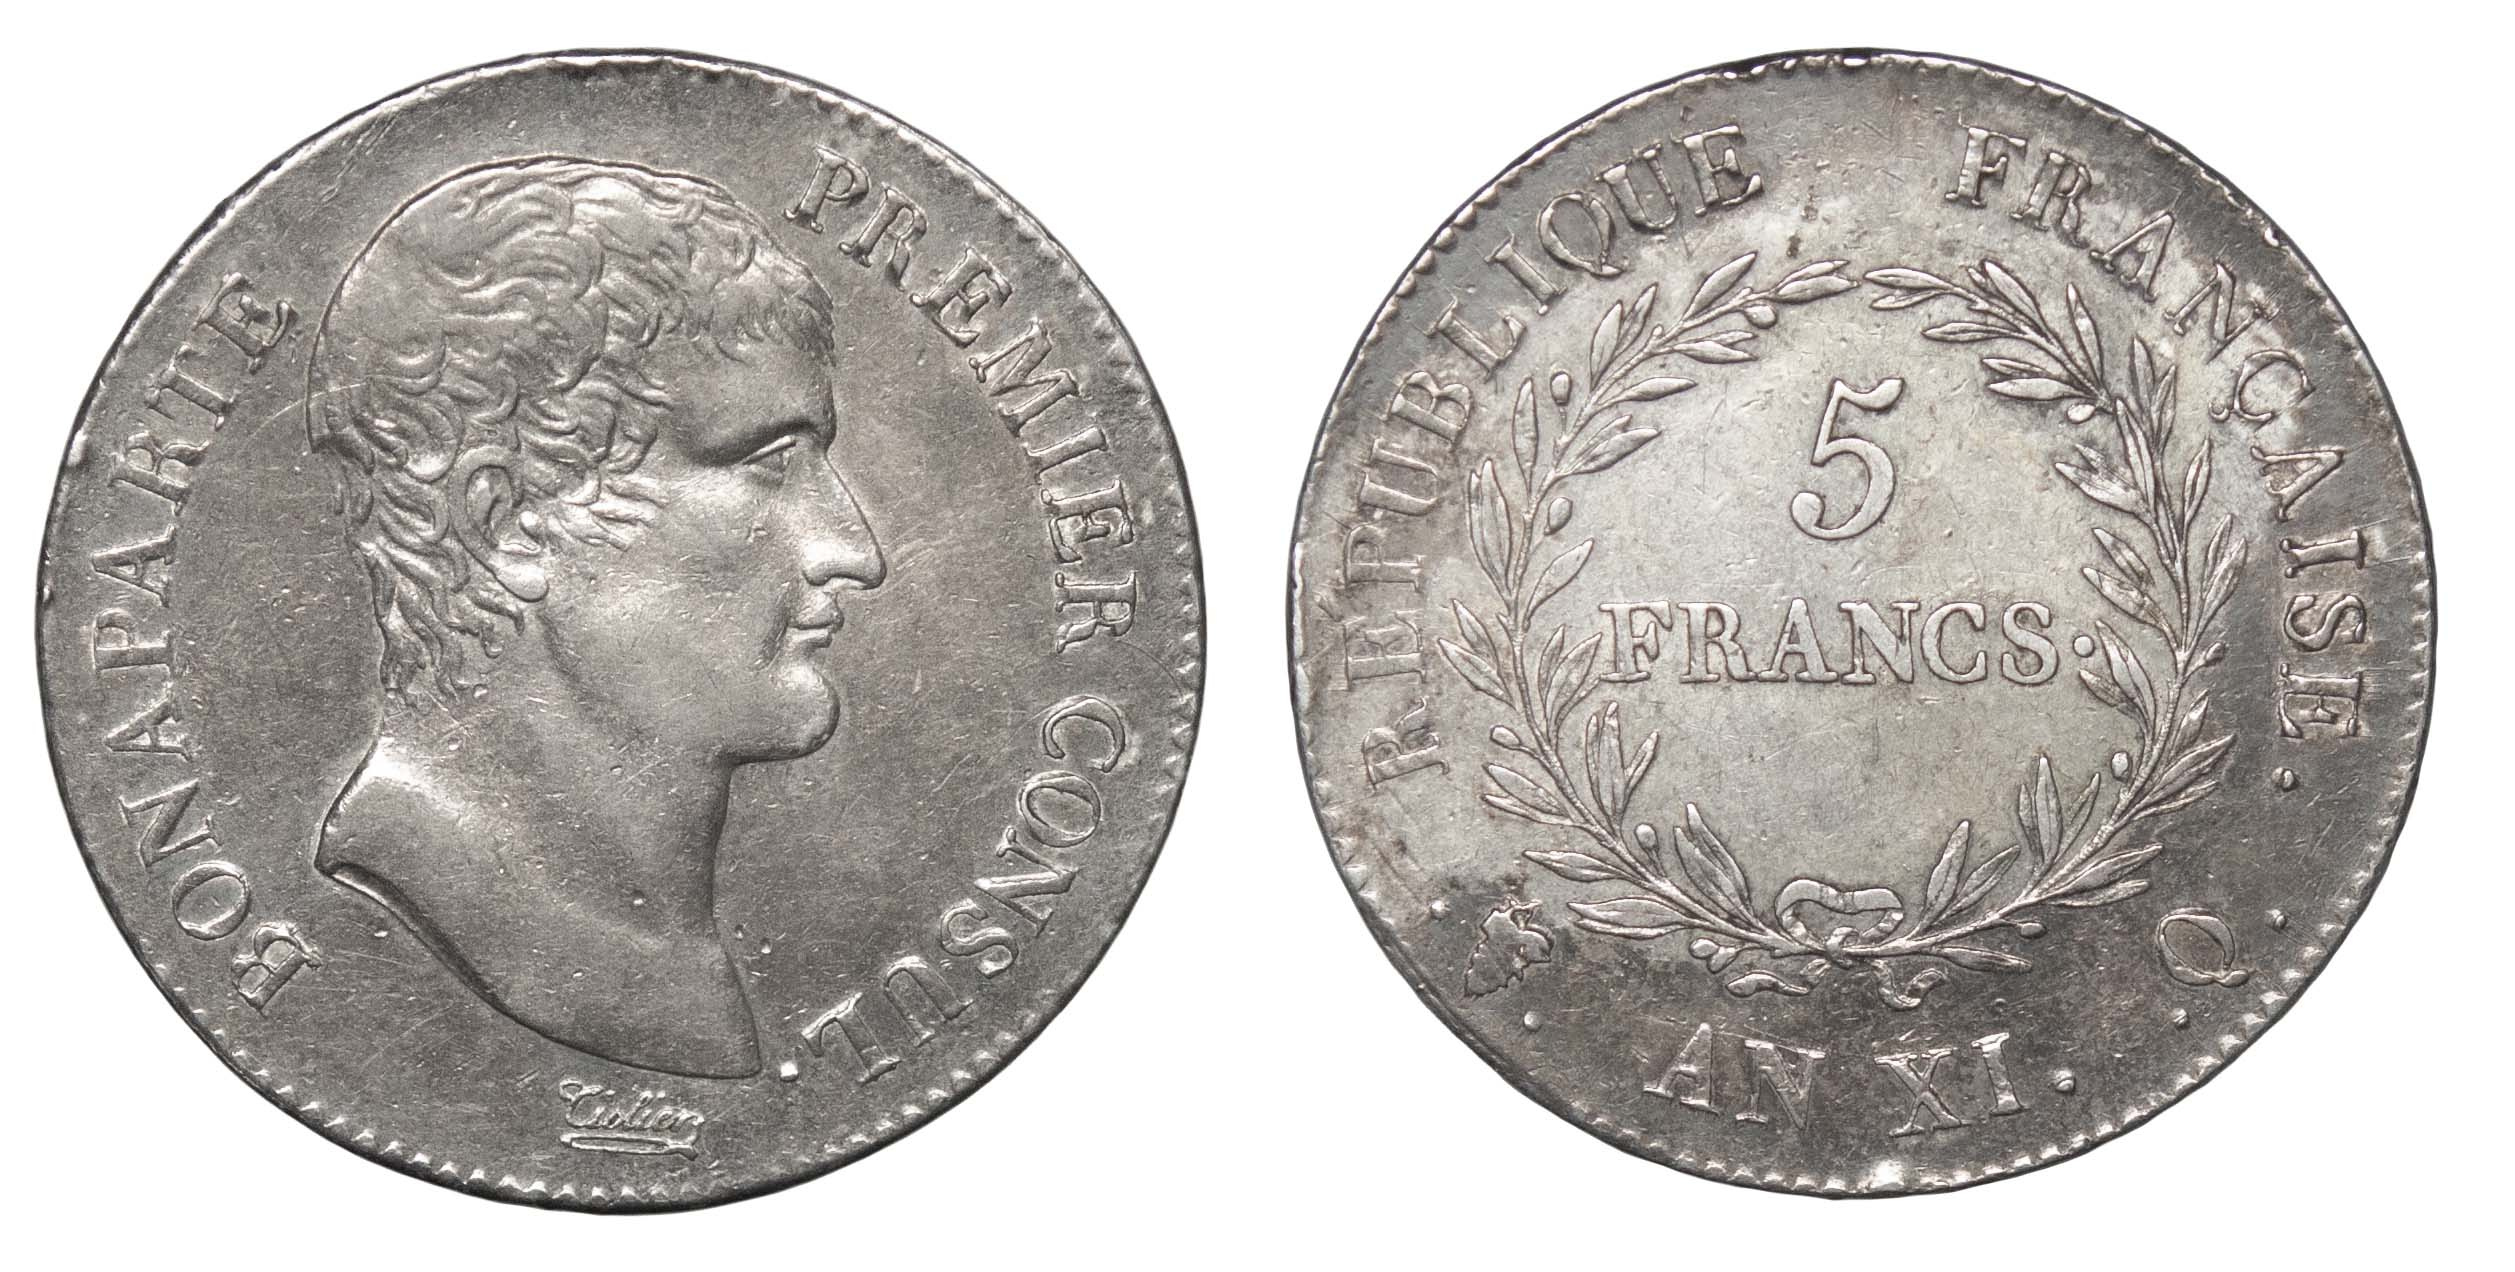 France, Napoleon (1792-1804), 5 Francs, 1803